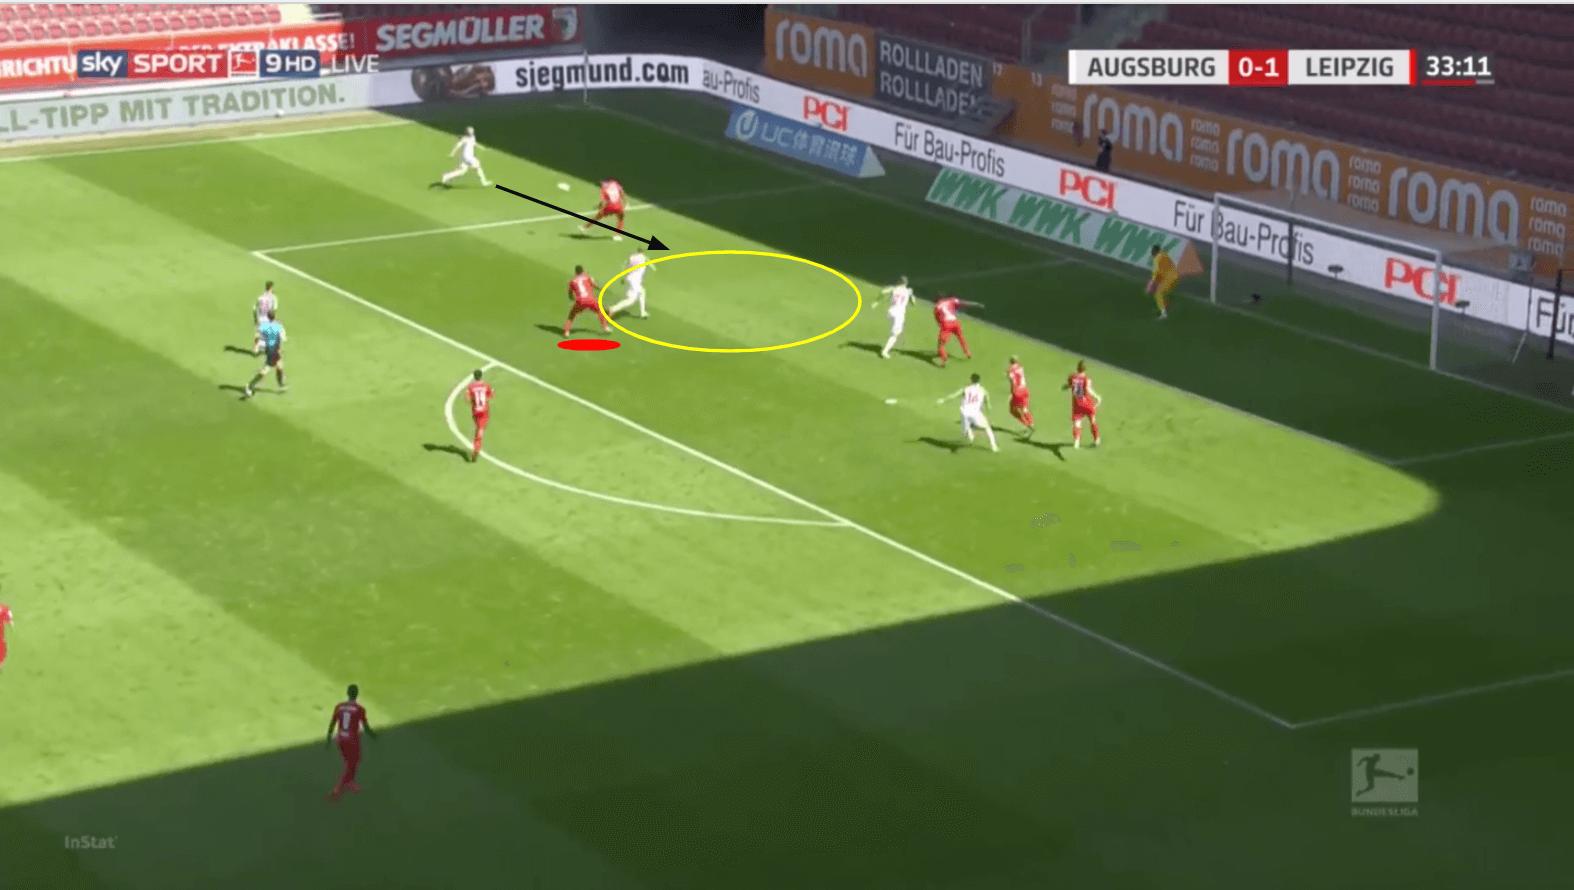 Bundesliga 2019/20: Augsburg vs RB Leipzig - tactical analysis tactics